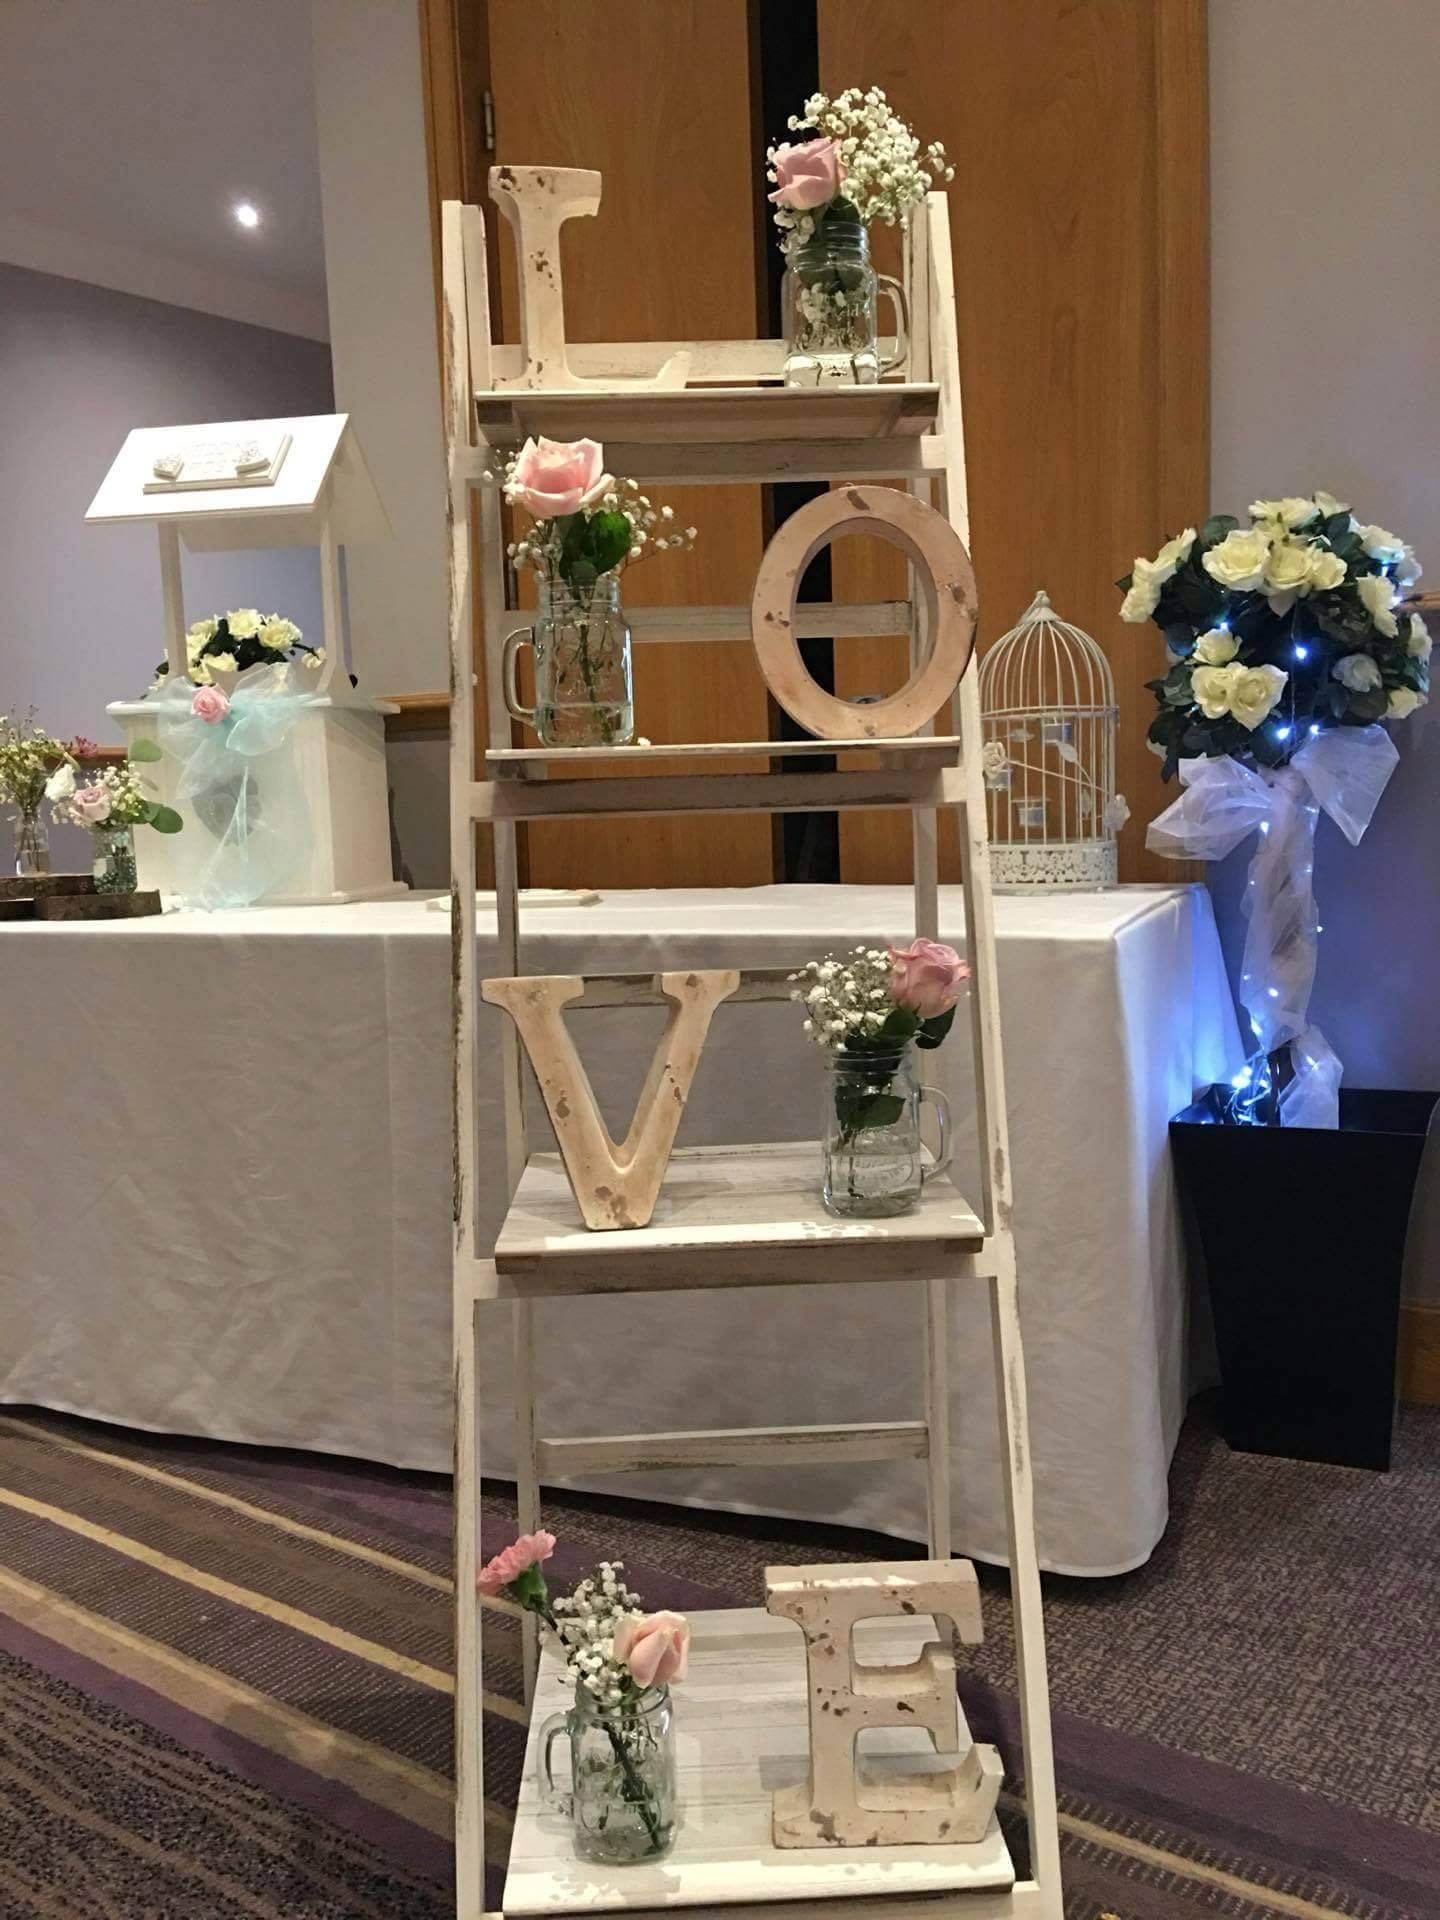 LOVE Ladders